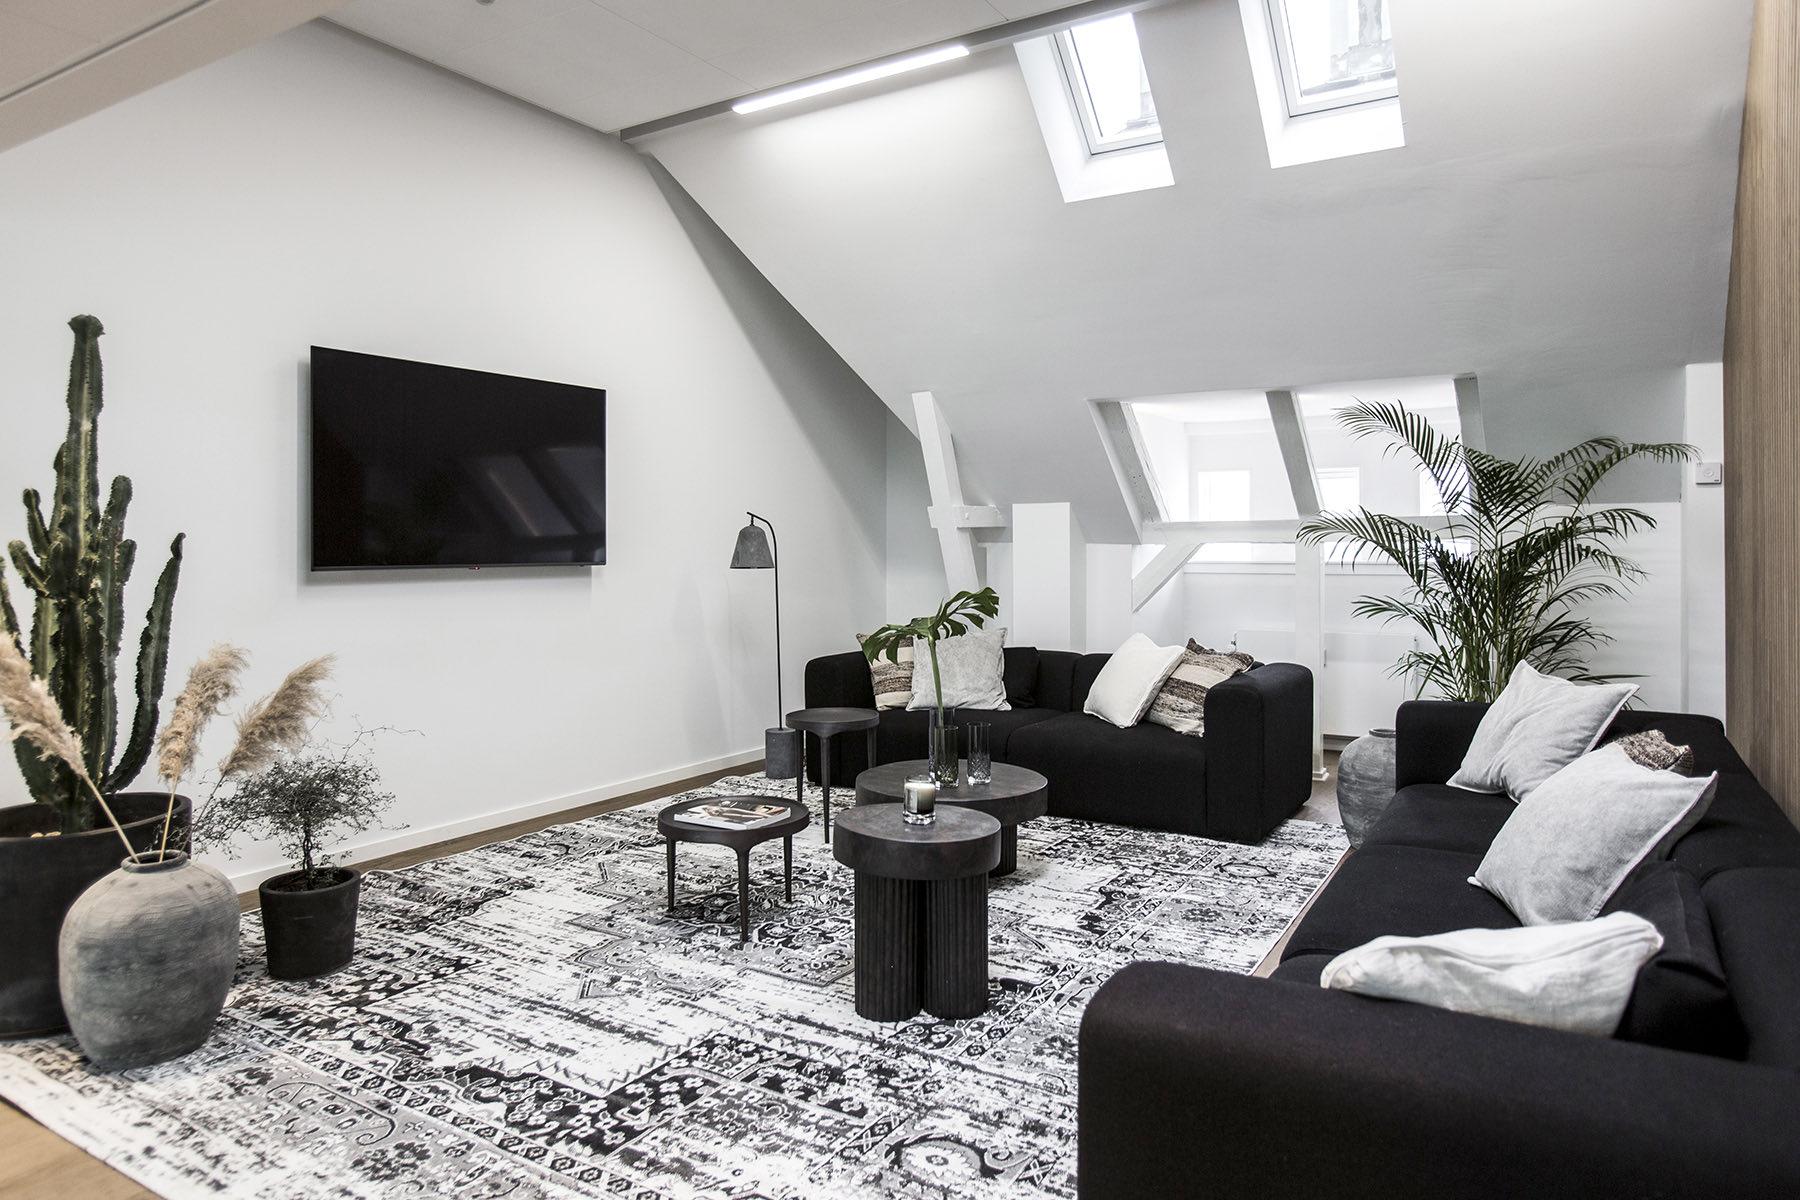 A Peek Inside Lunar's Cool New Copenhagen Office